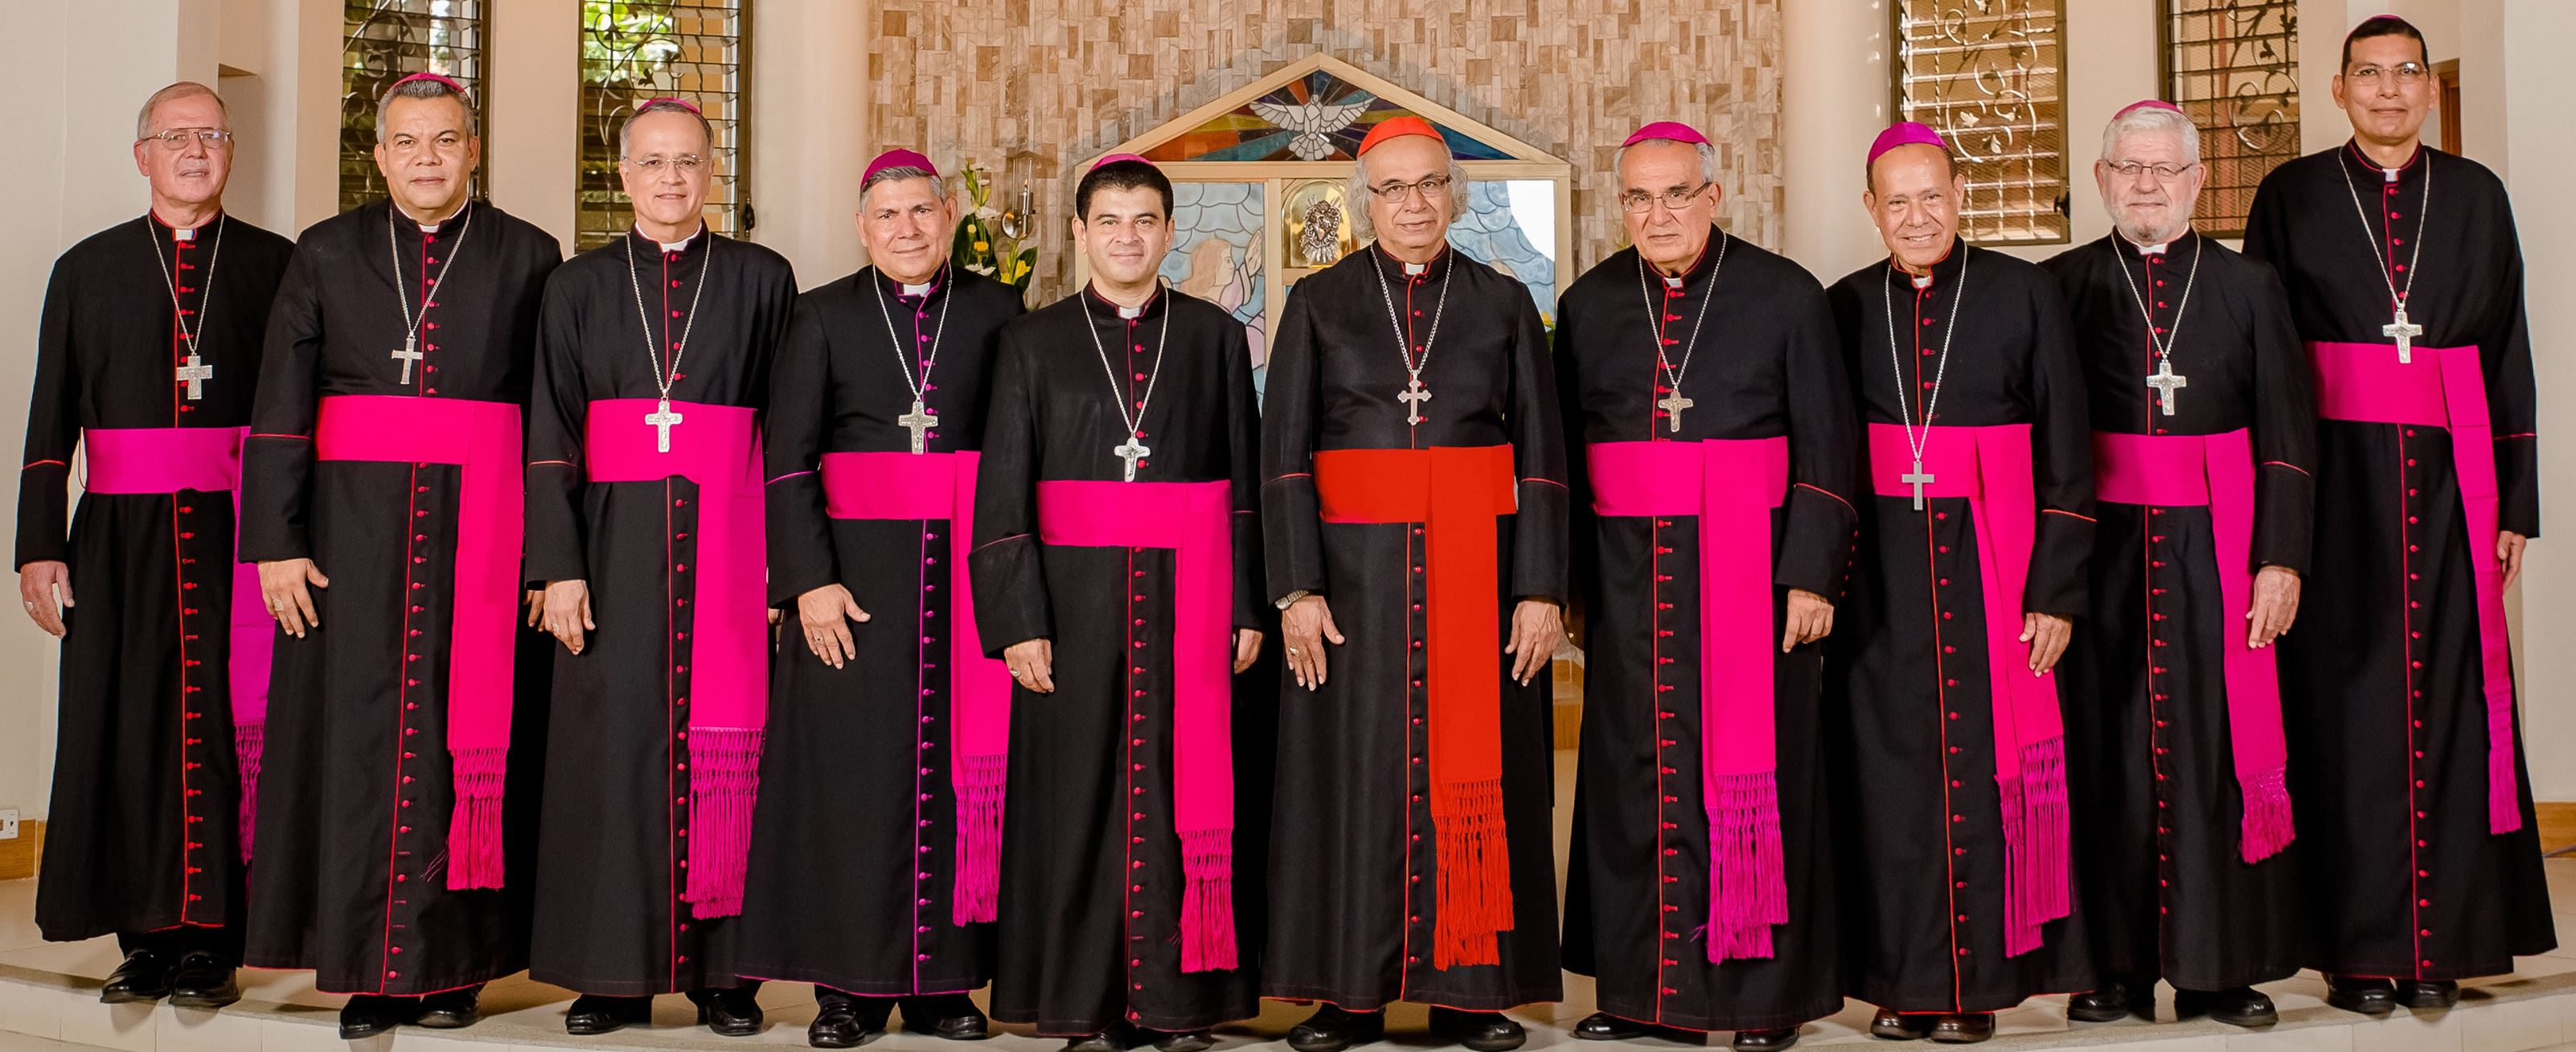 Obispos de Nicaragua © Facebook Conferencia Episcopal de Nicaragua